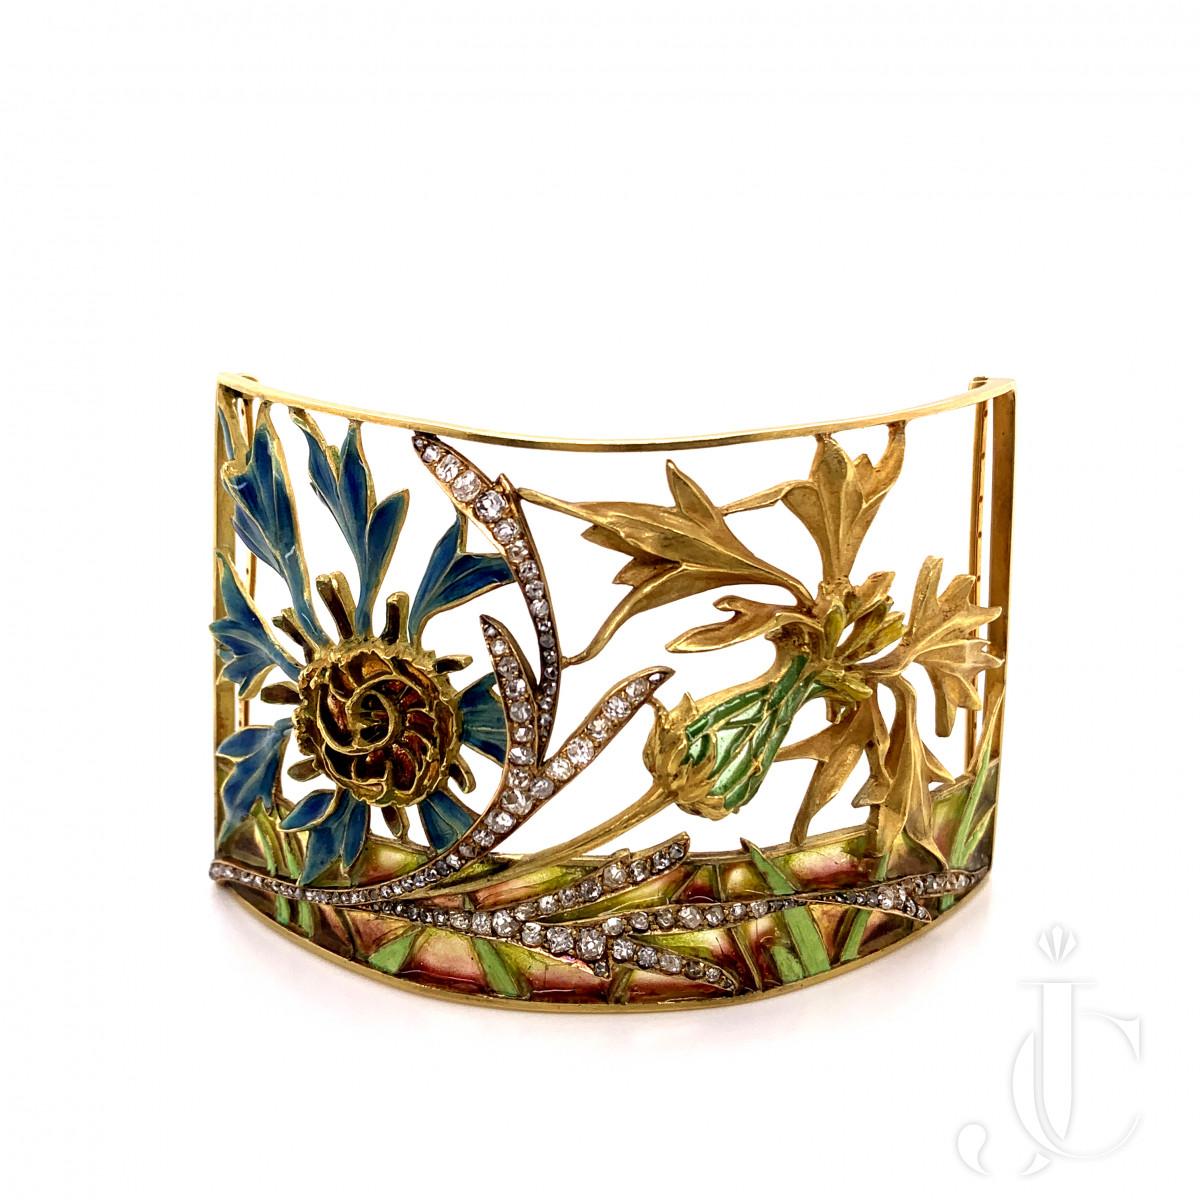 An 18 carat gold French plique-a-jour enameled Art Nouveau choker set with  by Gaillard